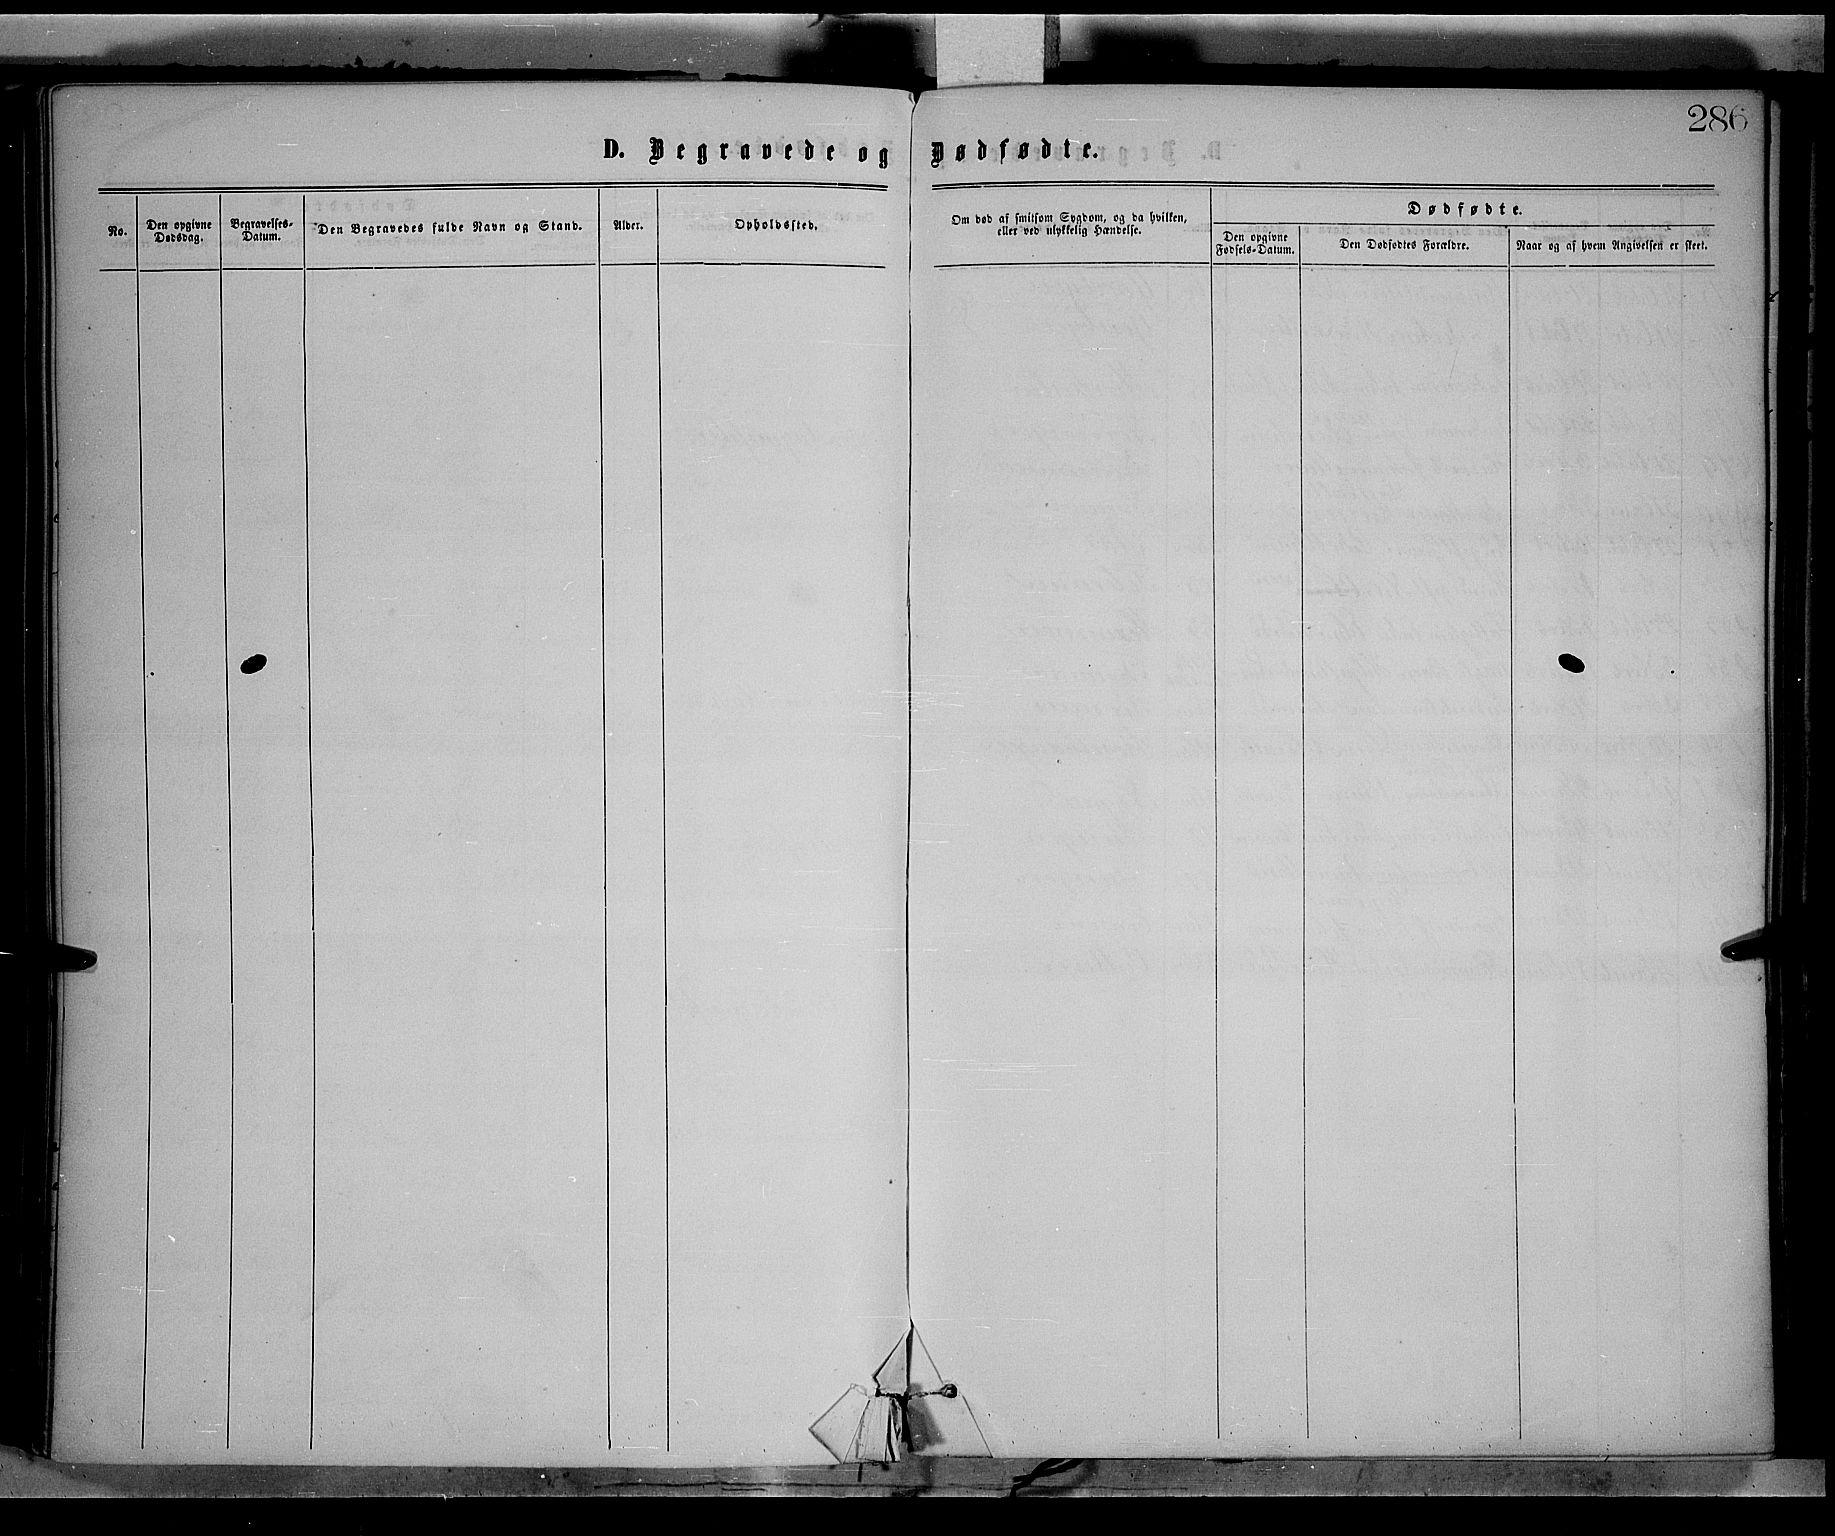 SAH, Vestre Toten prestekontor, H/Ha/Haa/L0008: Ministerialbok nr. 8, 1870-1877, s. 286